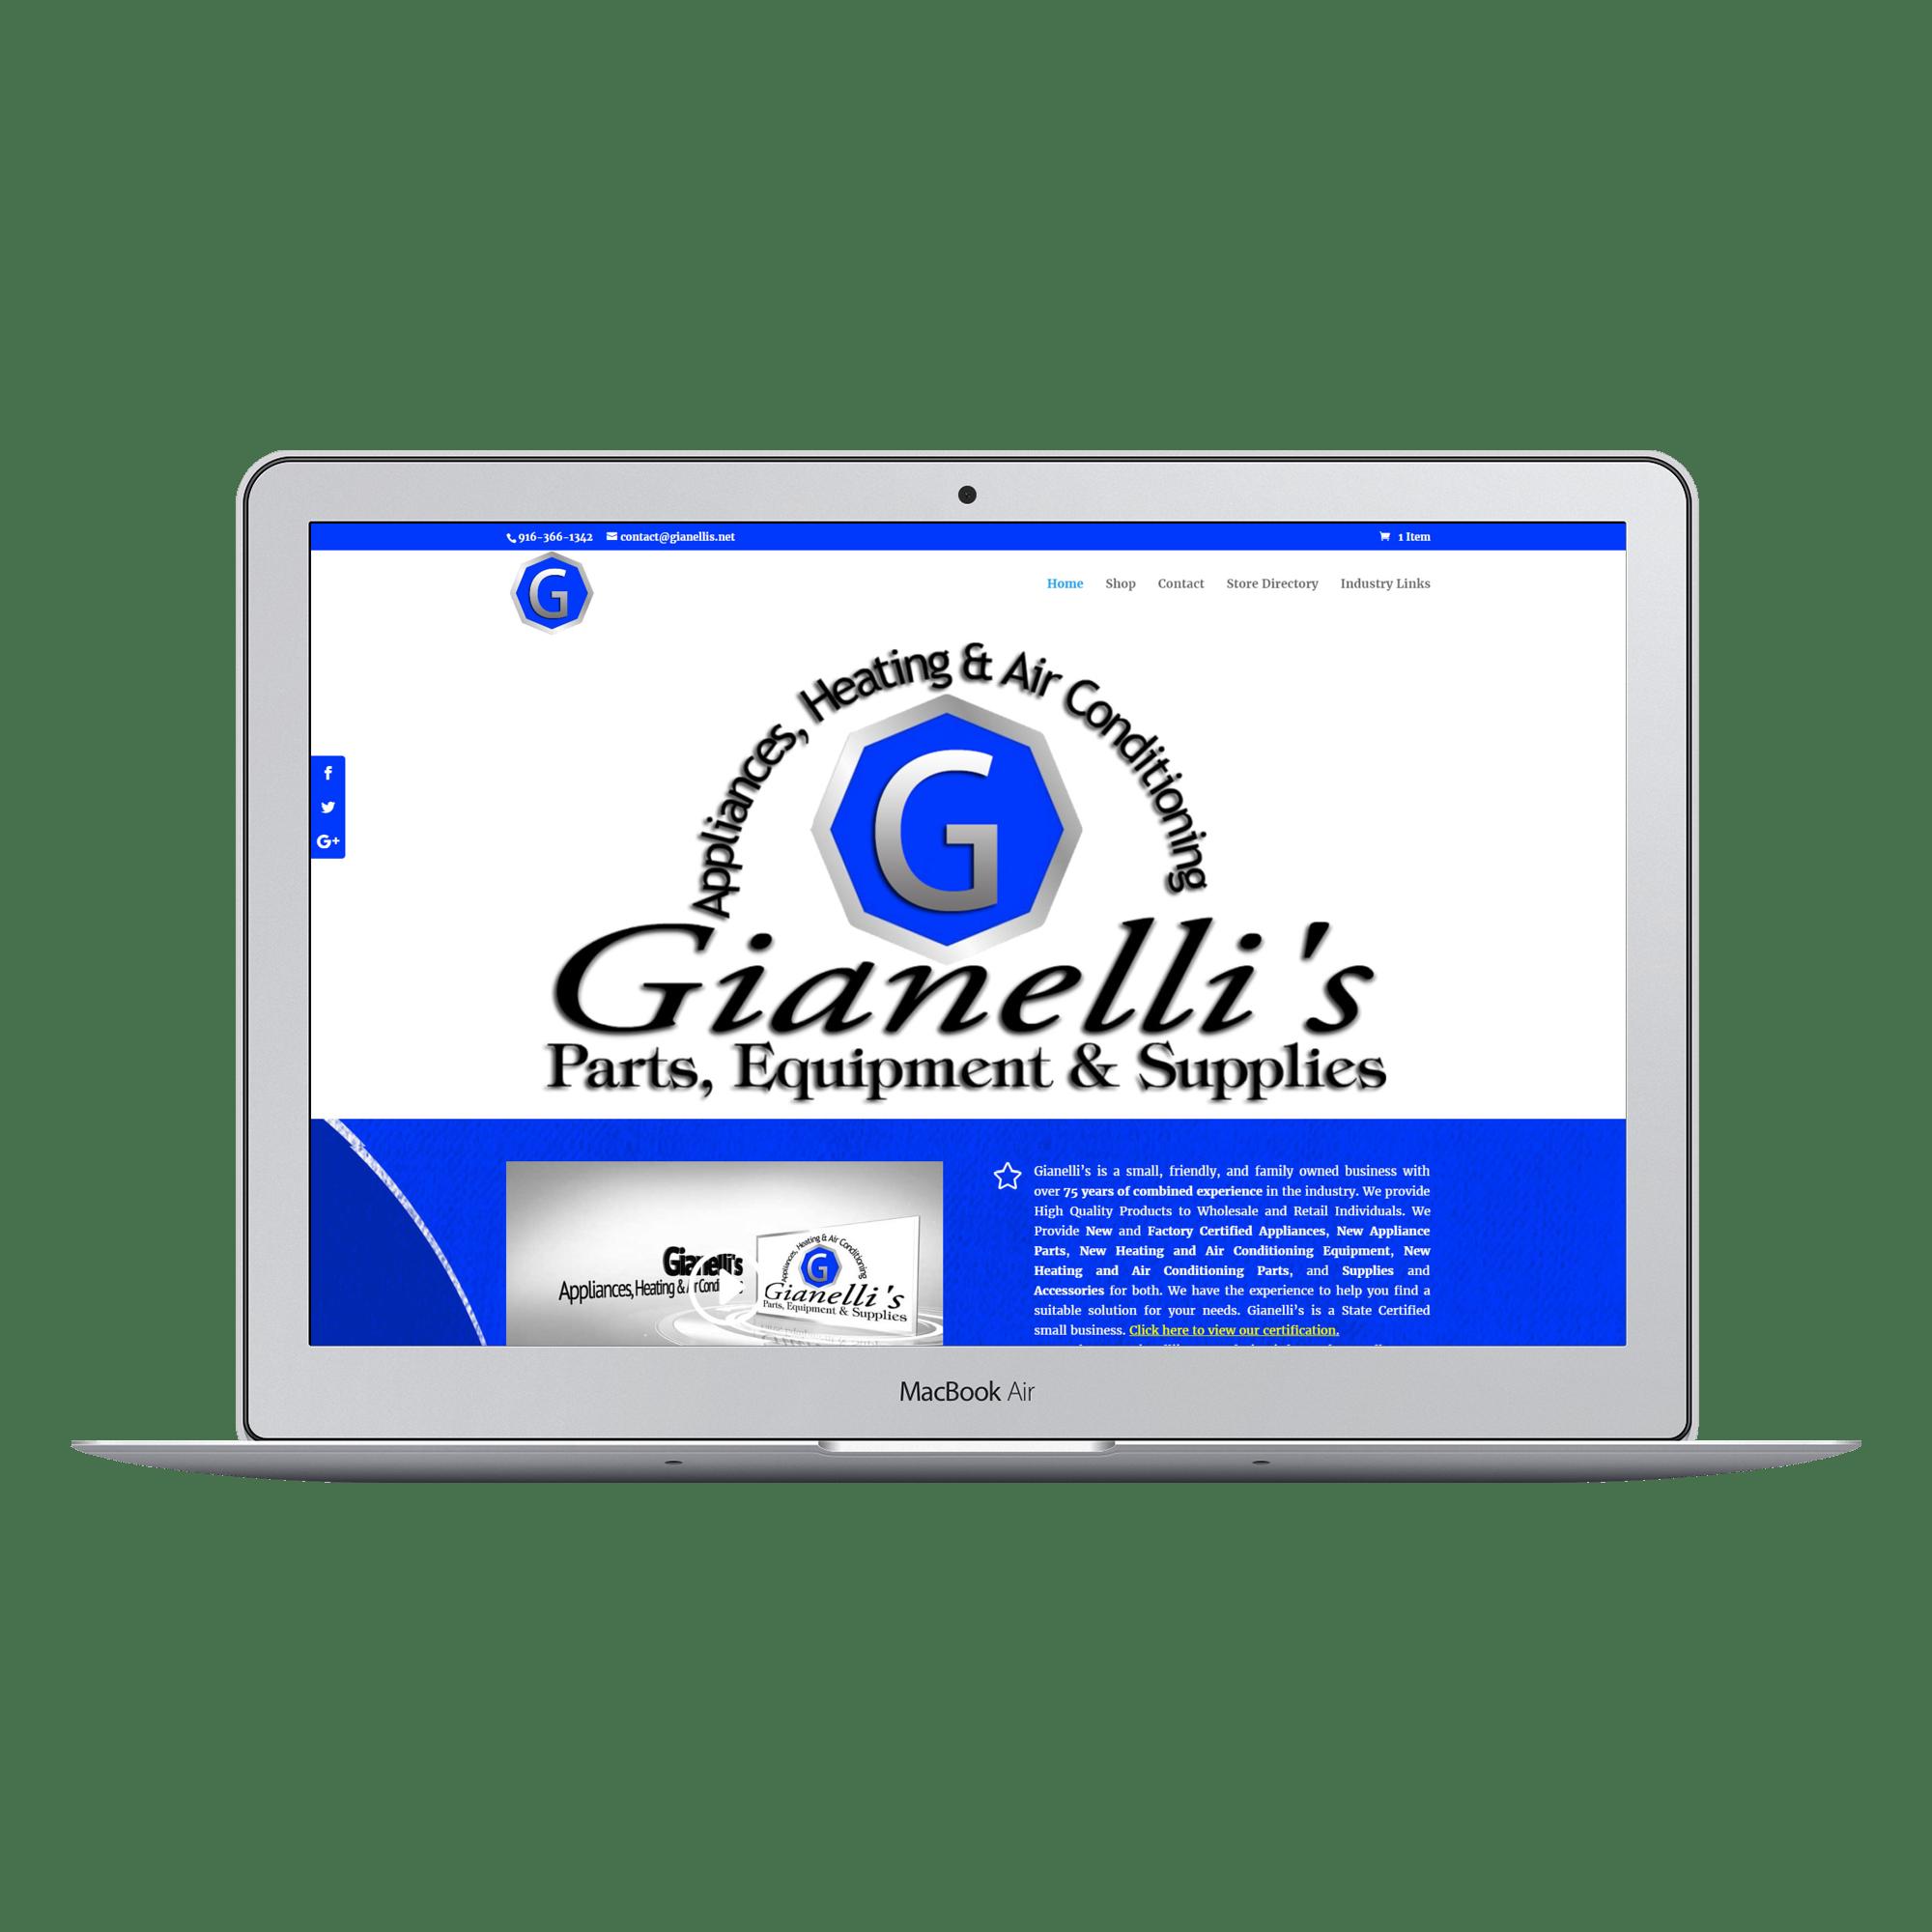 Gianellis Appliances and Supplies